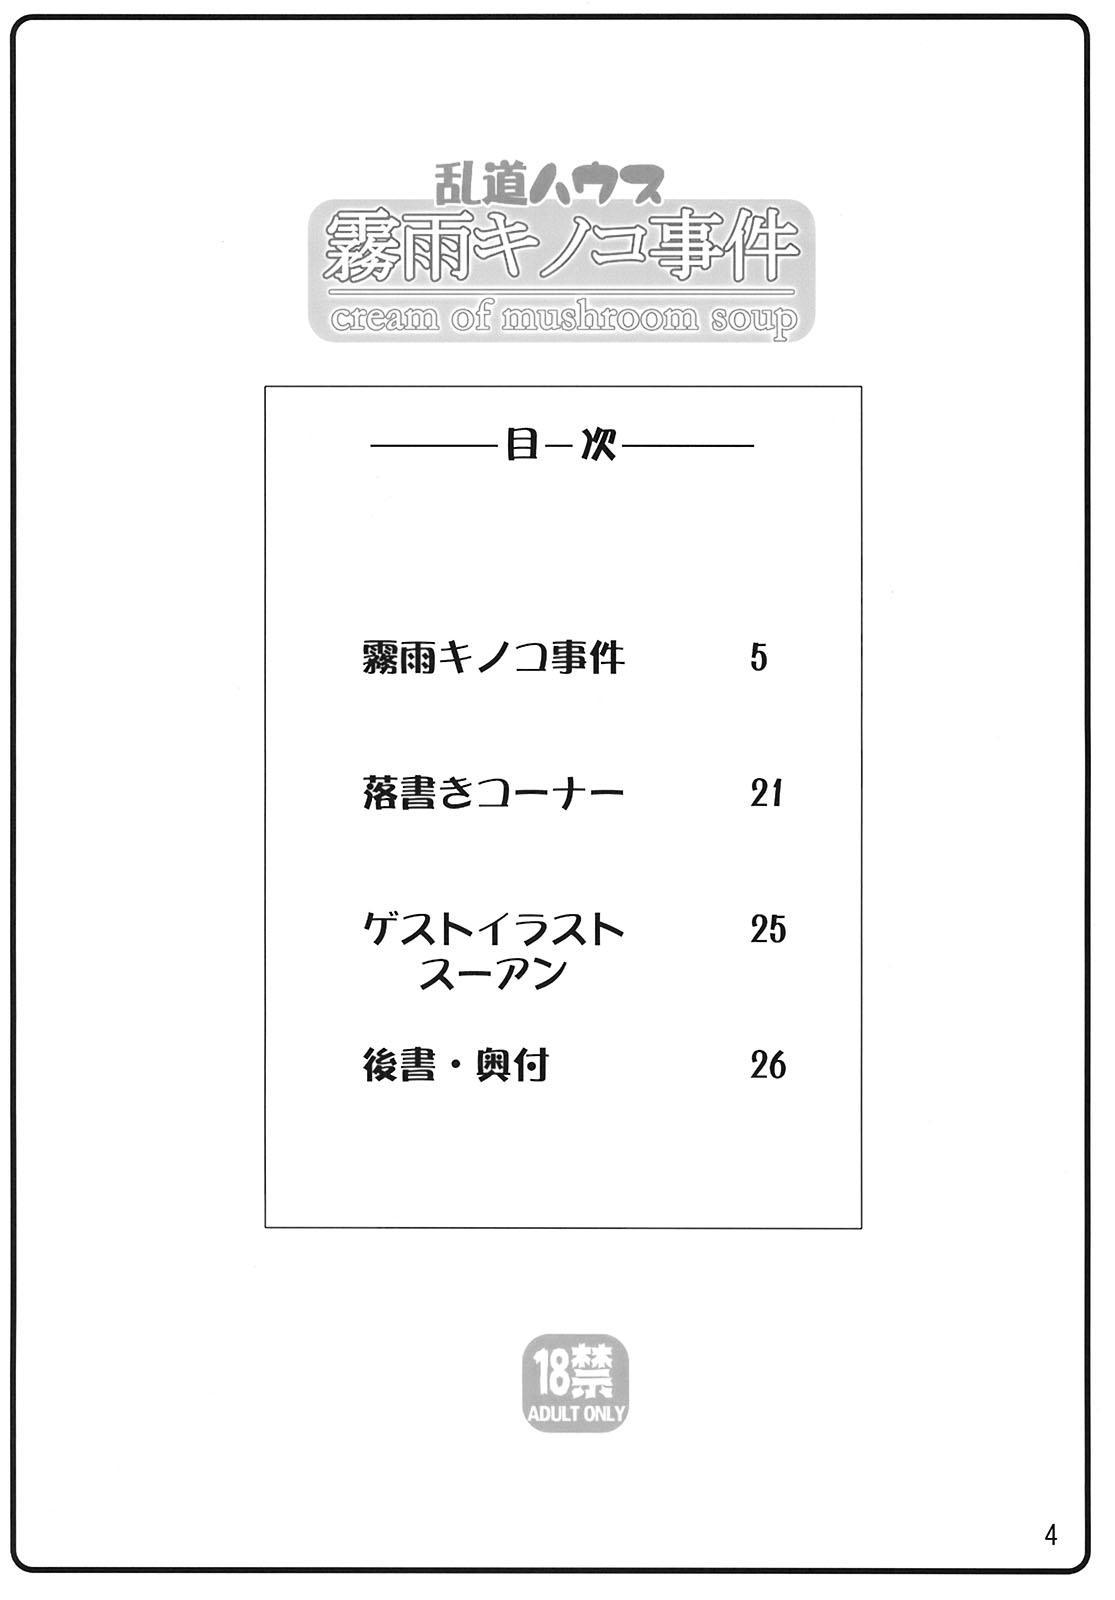 Kirisame Kinoko Jiken - cream of mushroom soup 3